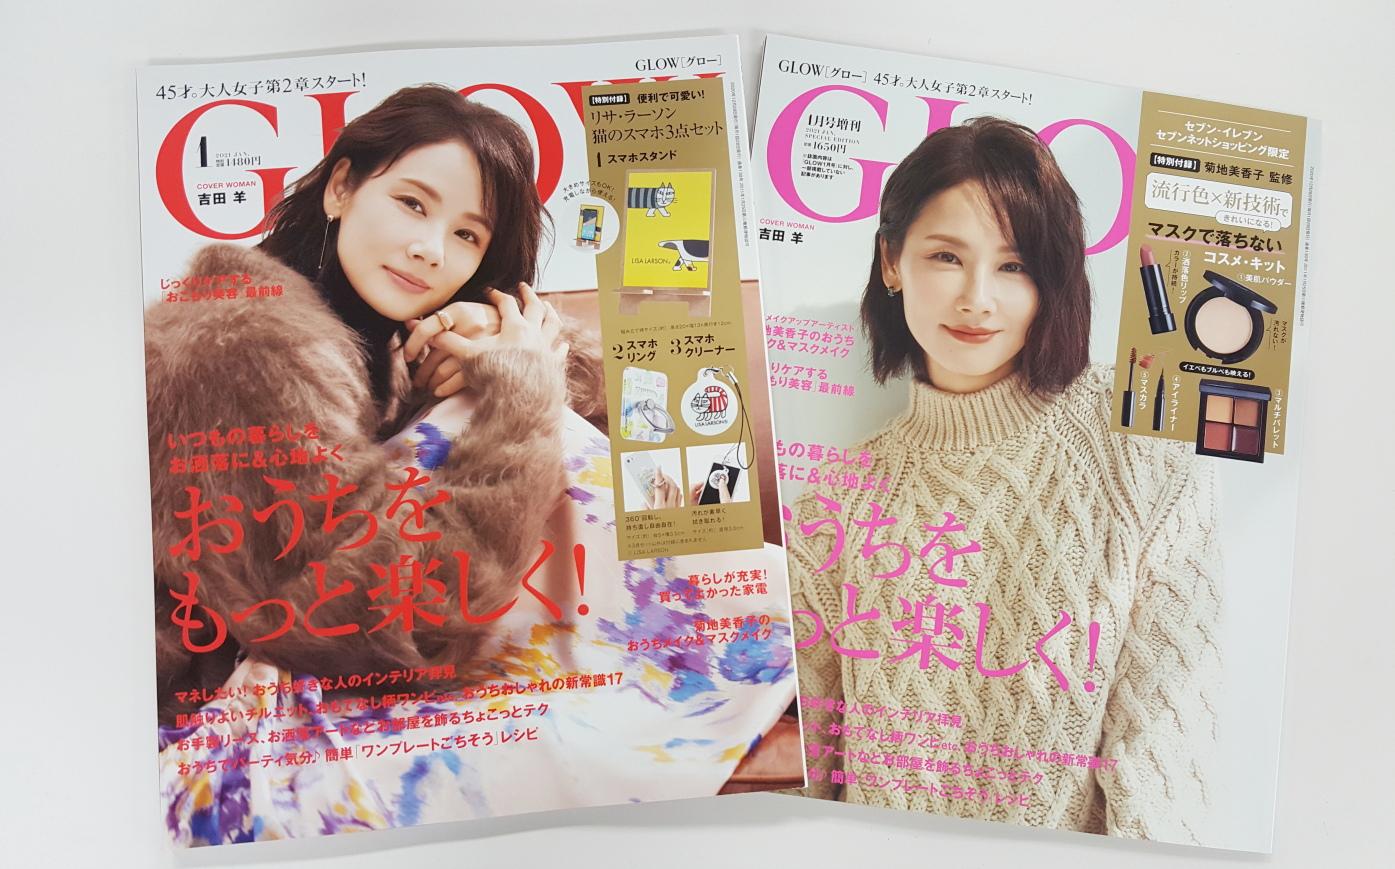 「GLOW」2021年1月号(宝島社)の通常号(写真左)、増刊号(写真右)